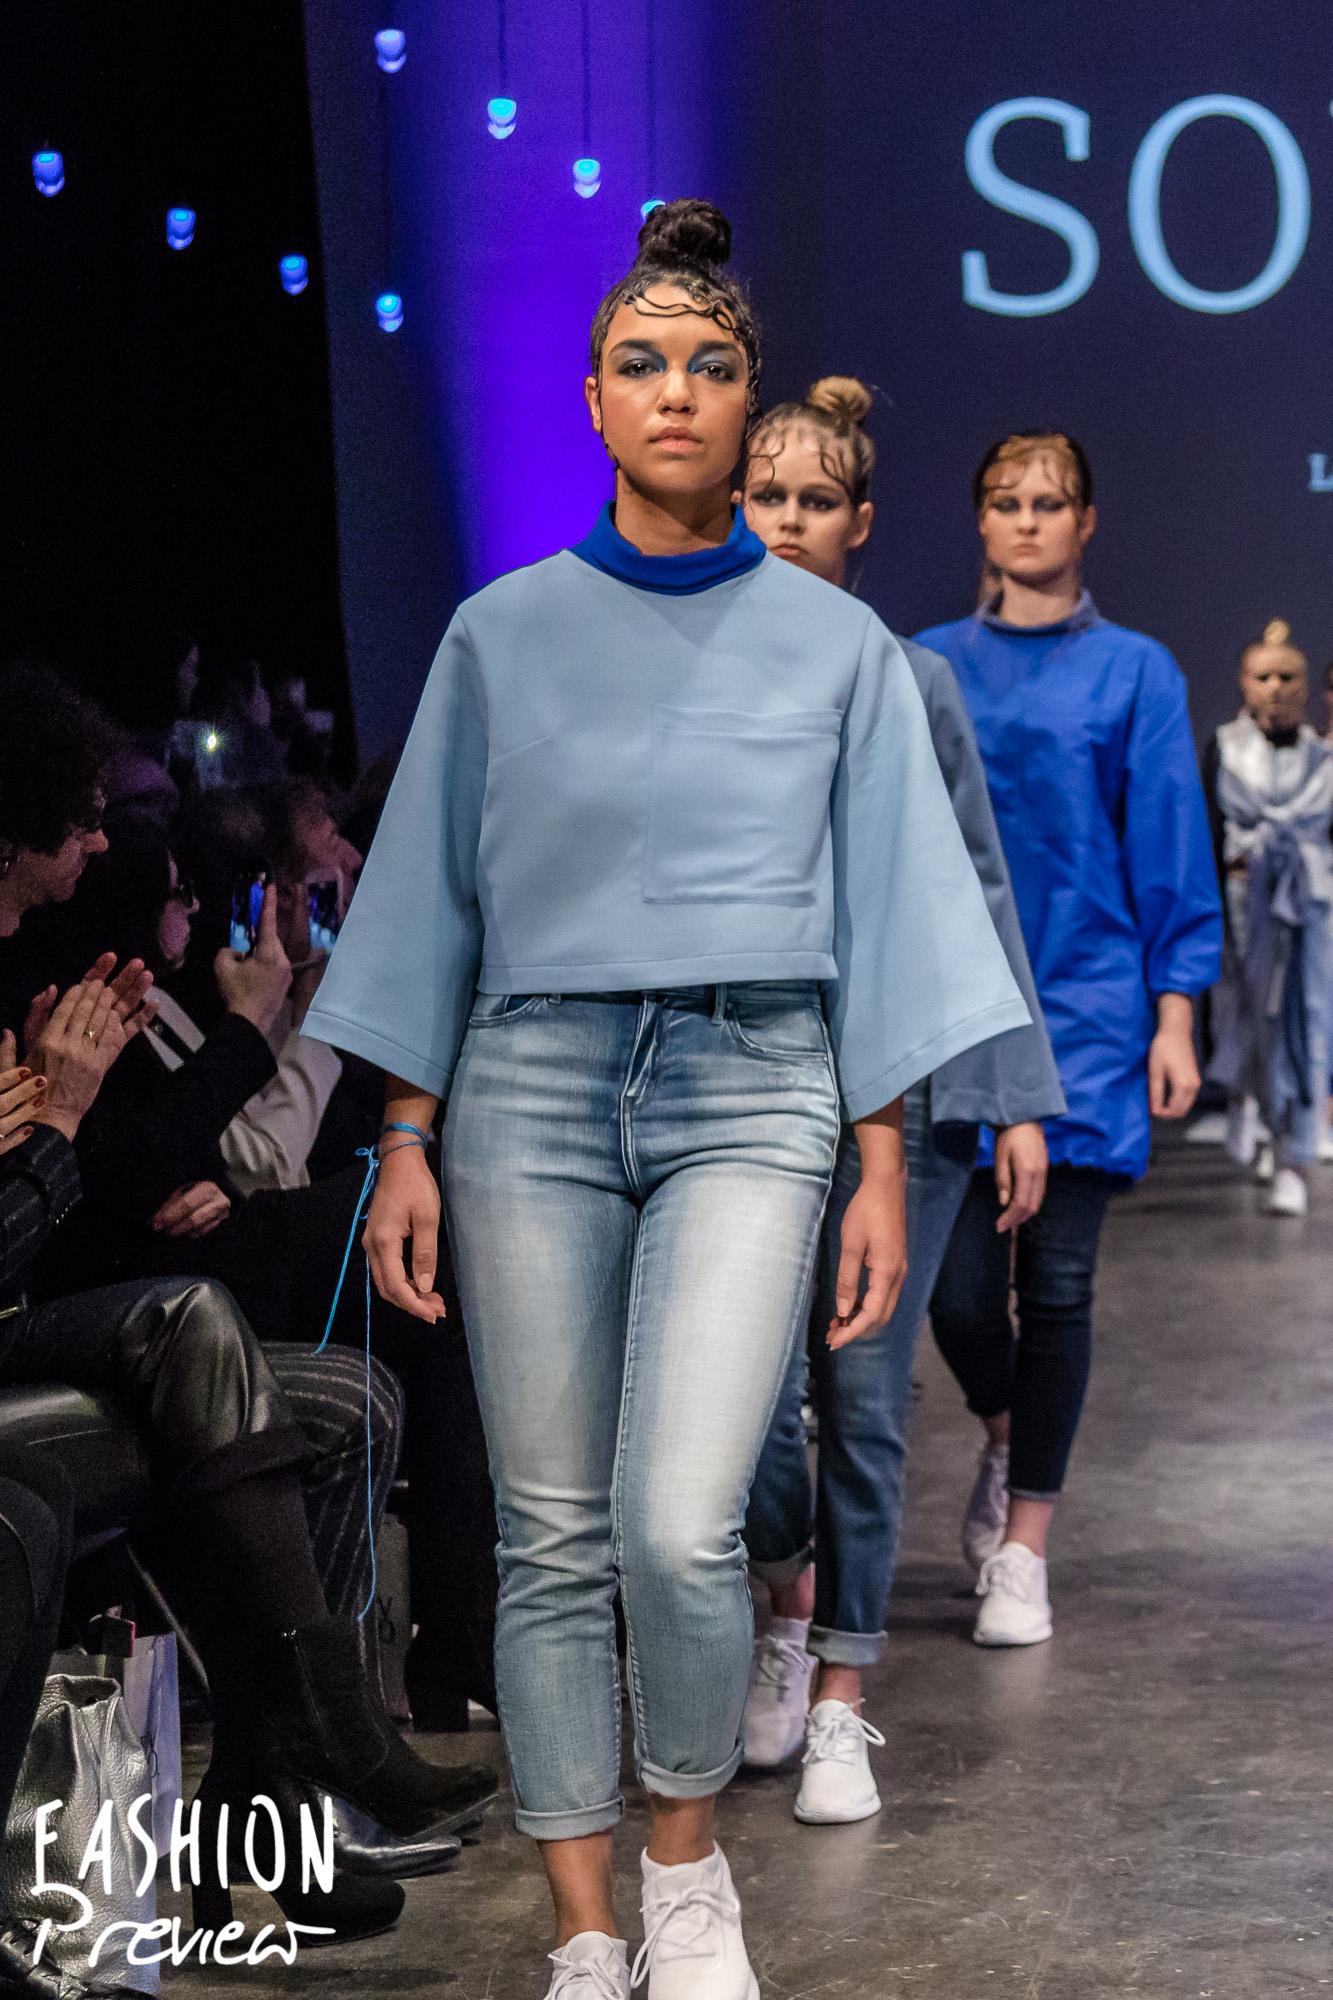 Fashion Preview 9 - Cegep Marie Victorin-24.jpg